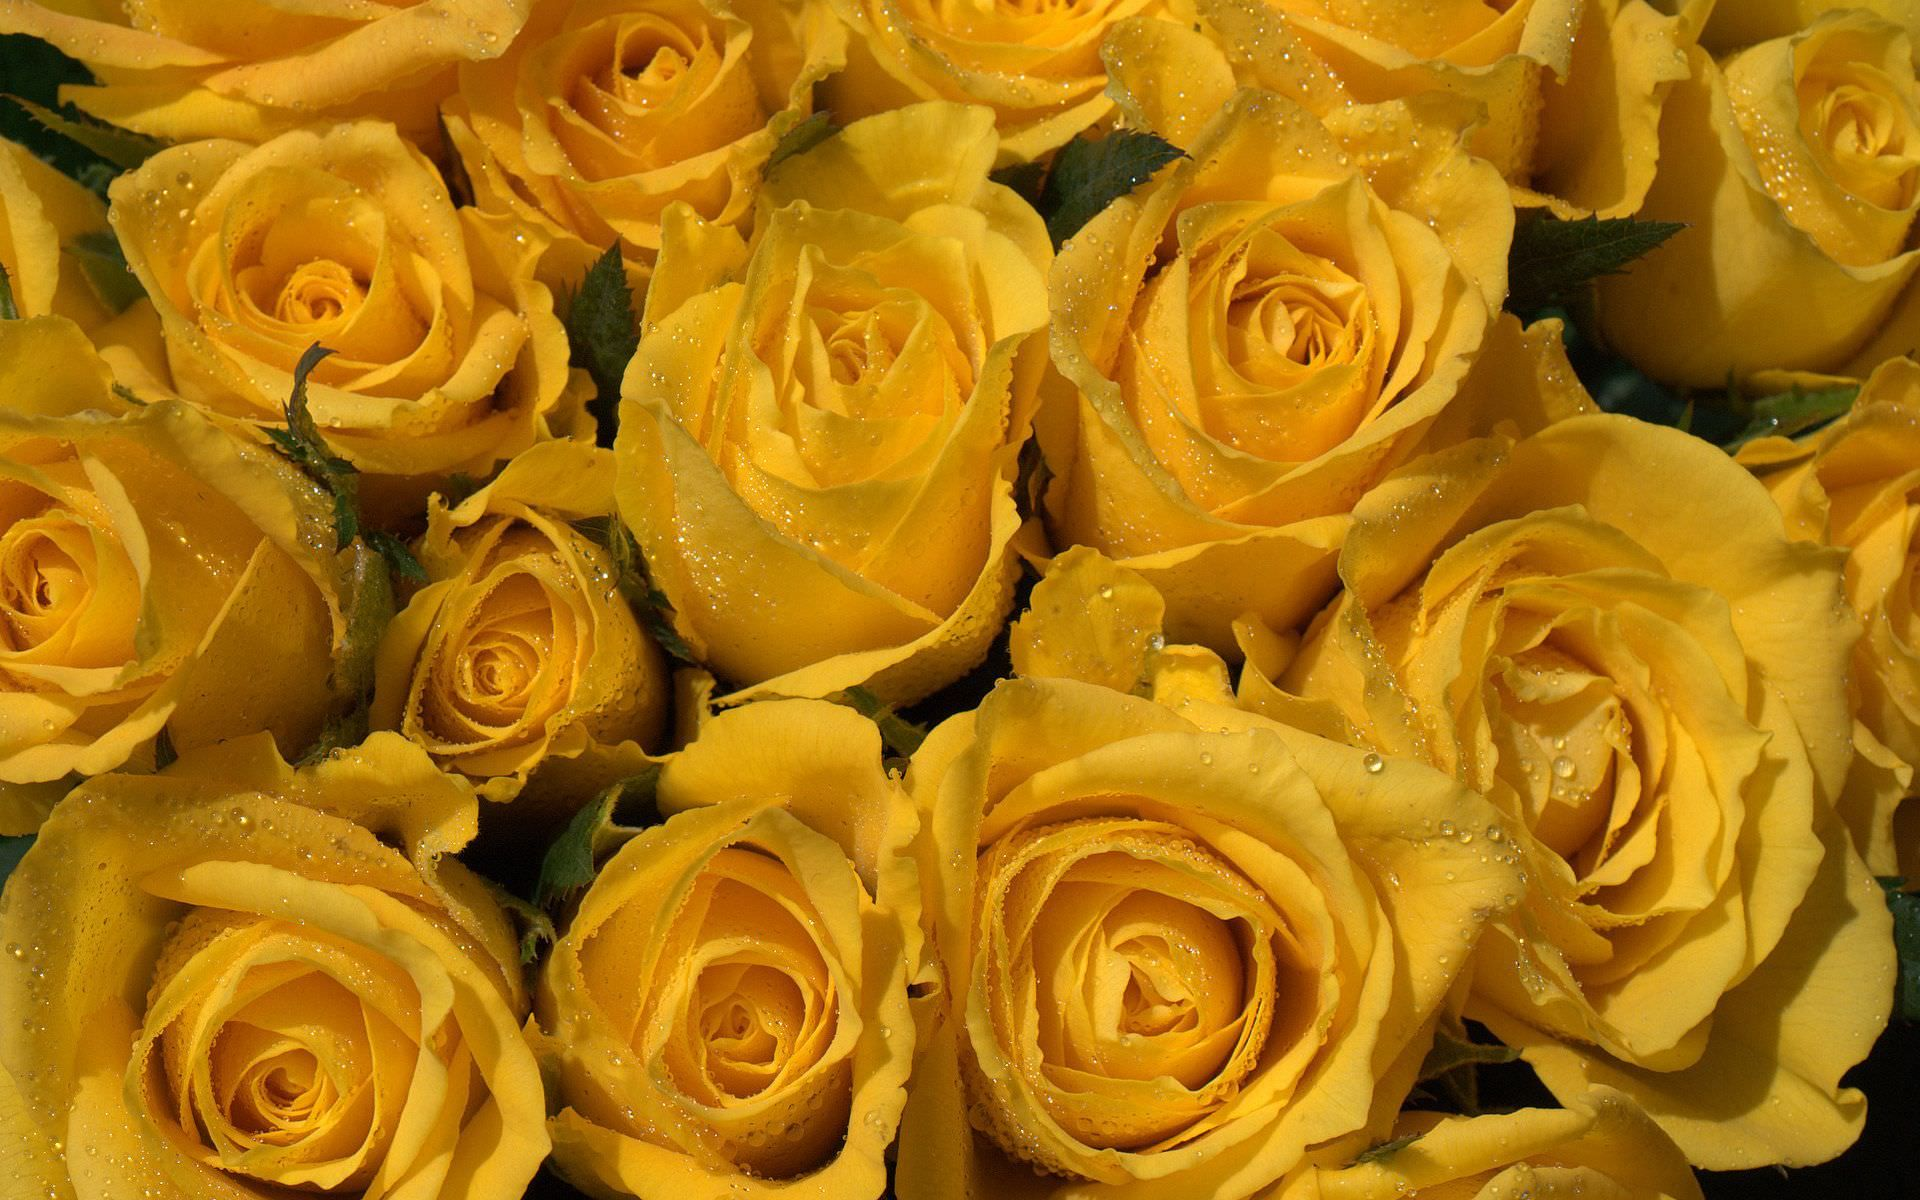 Yellow Rose Flower Wallpapers Wallpaper Wallpapers For Desktop